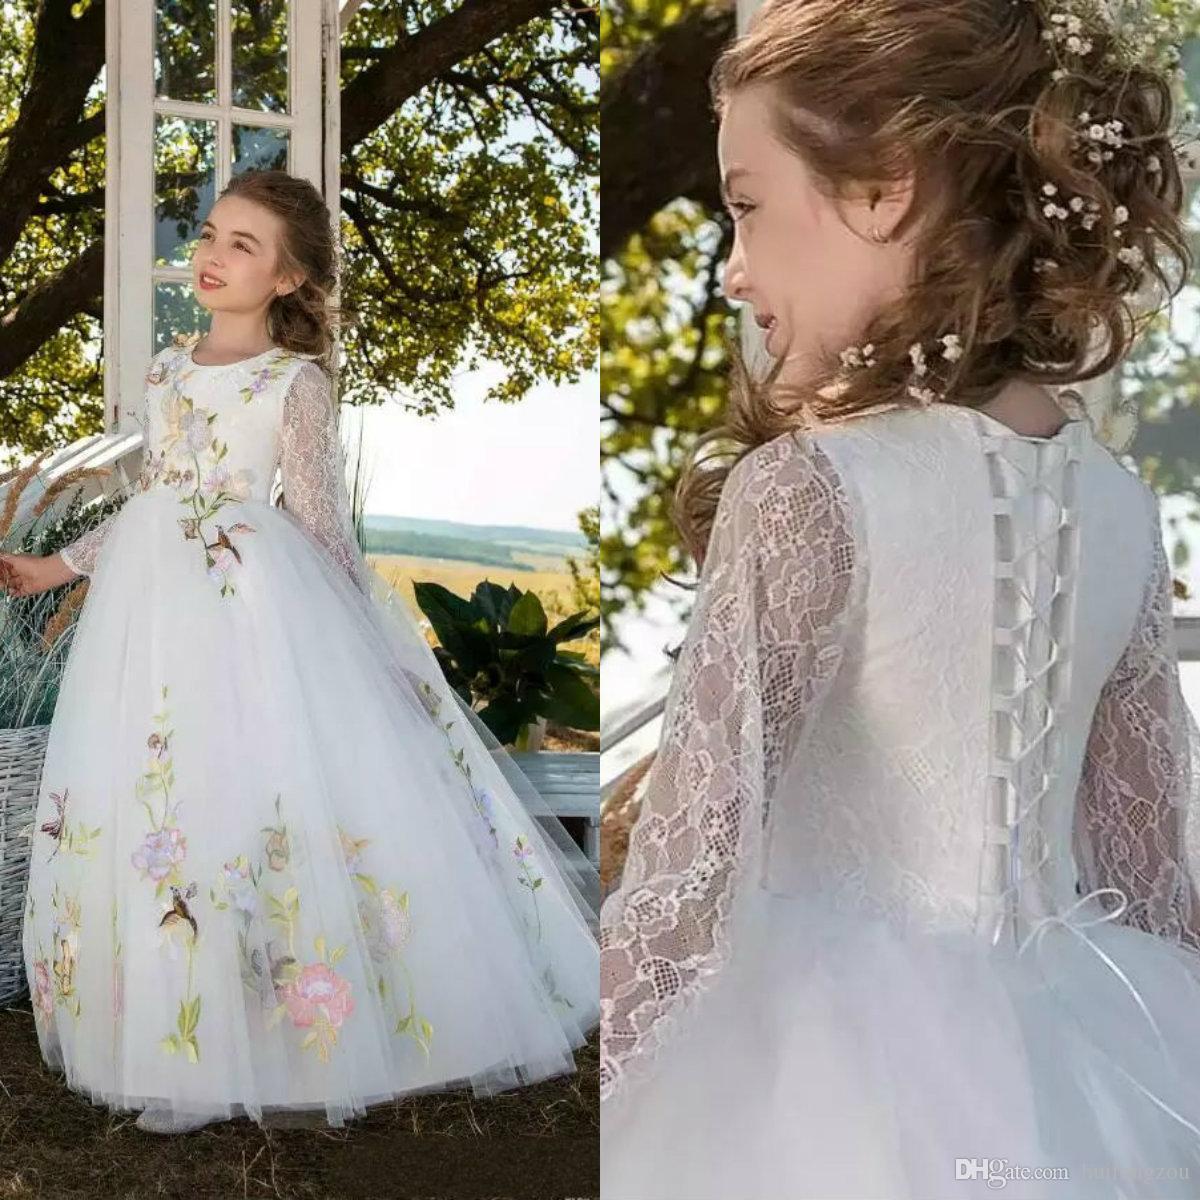 d917f8f00 2019 Vintage Flower Girl Dresses Lace Long Sleeve Handmade Embroidery Tulle  Floor Length Girls Pageant Dress Custom Made Kids Formal Wear Lime Green  Flower ...